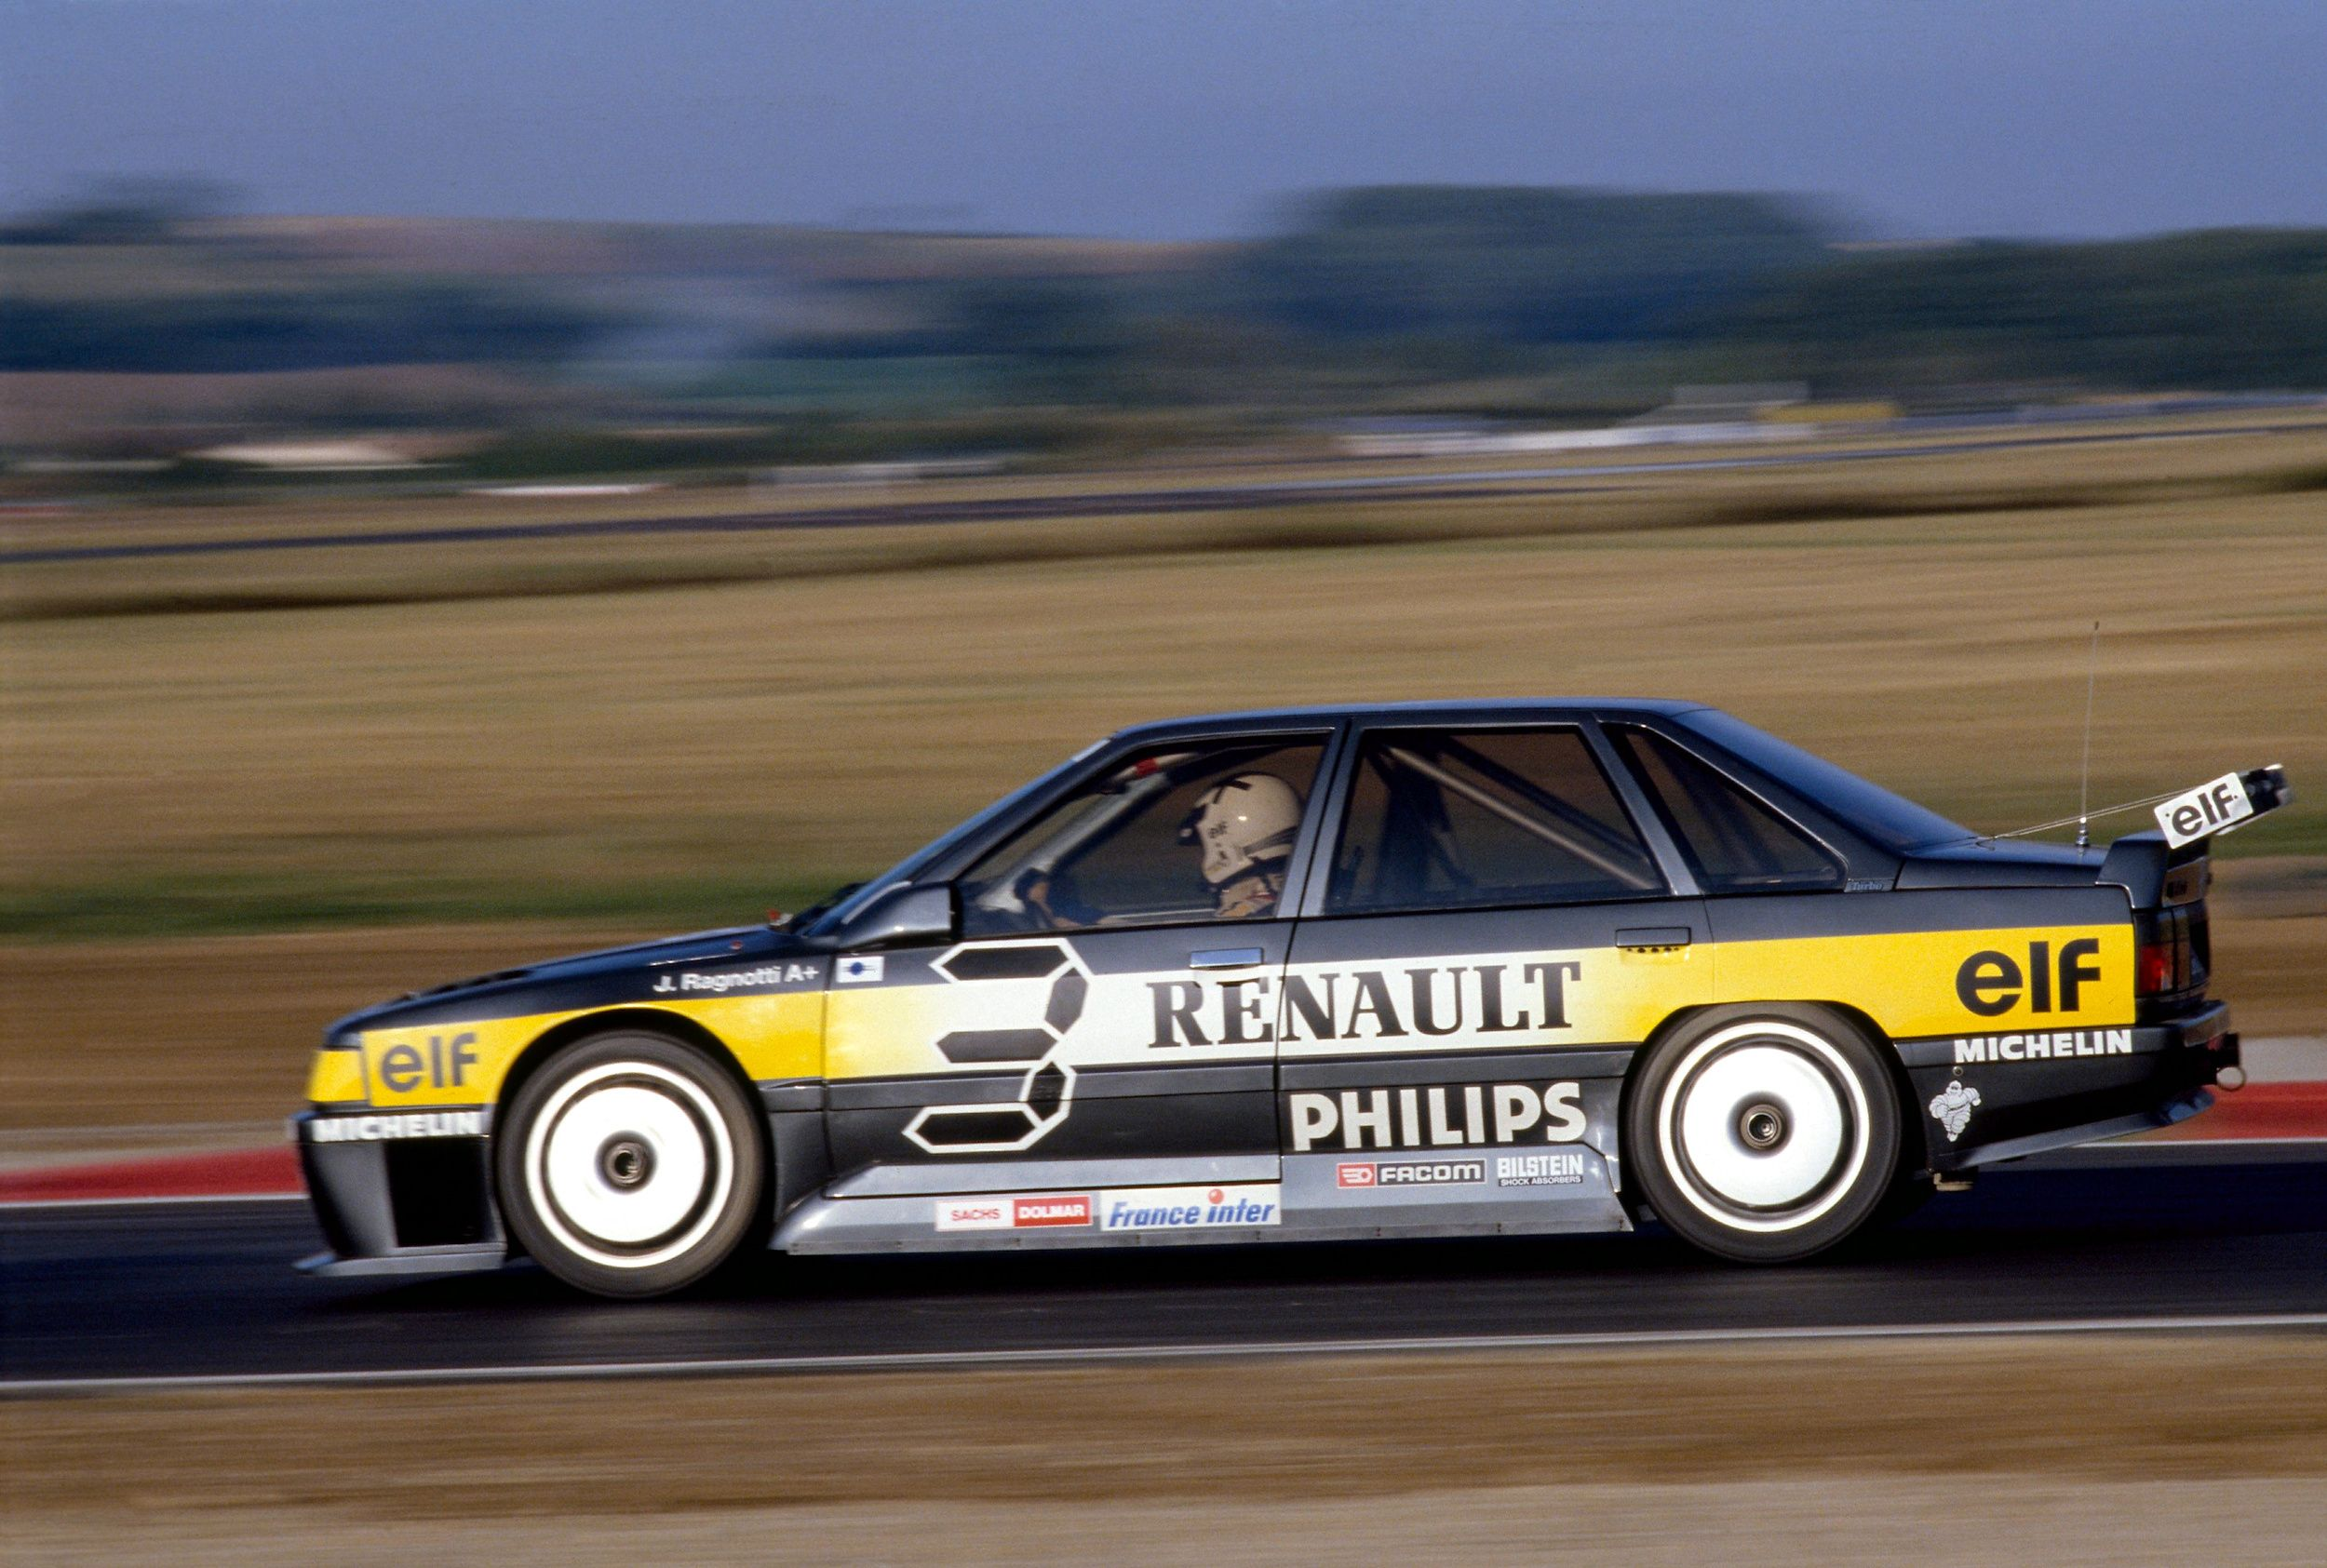 Renault 21 Turbo 4x4 Super Production Race Car | Classic Cars ...